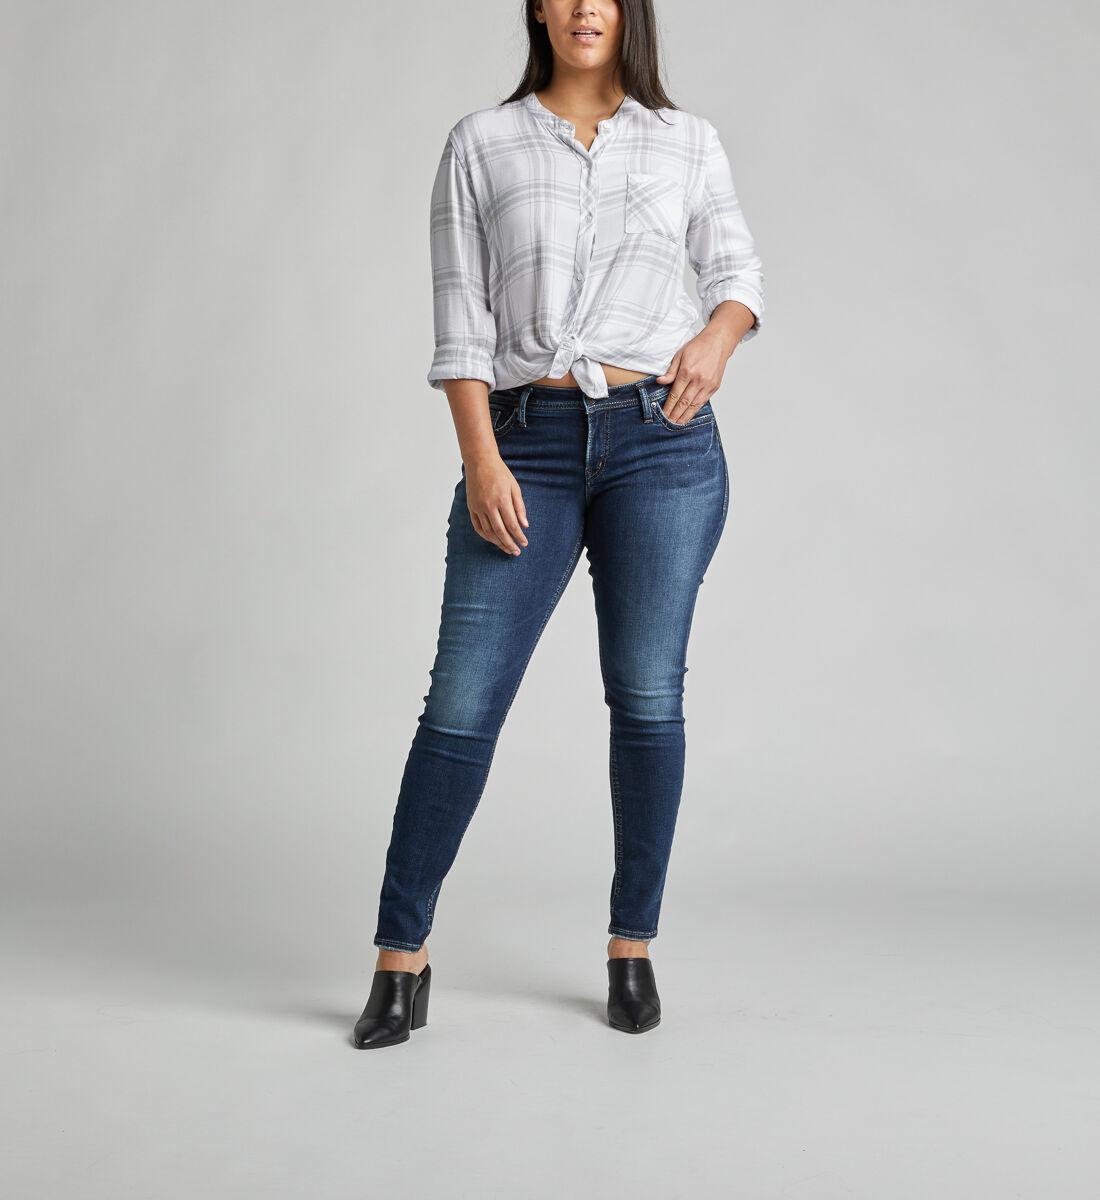 Suki Mid Rise Super Skinny Jeans Plus Size Alt Image 1